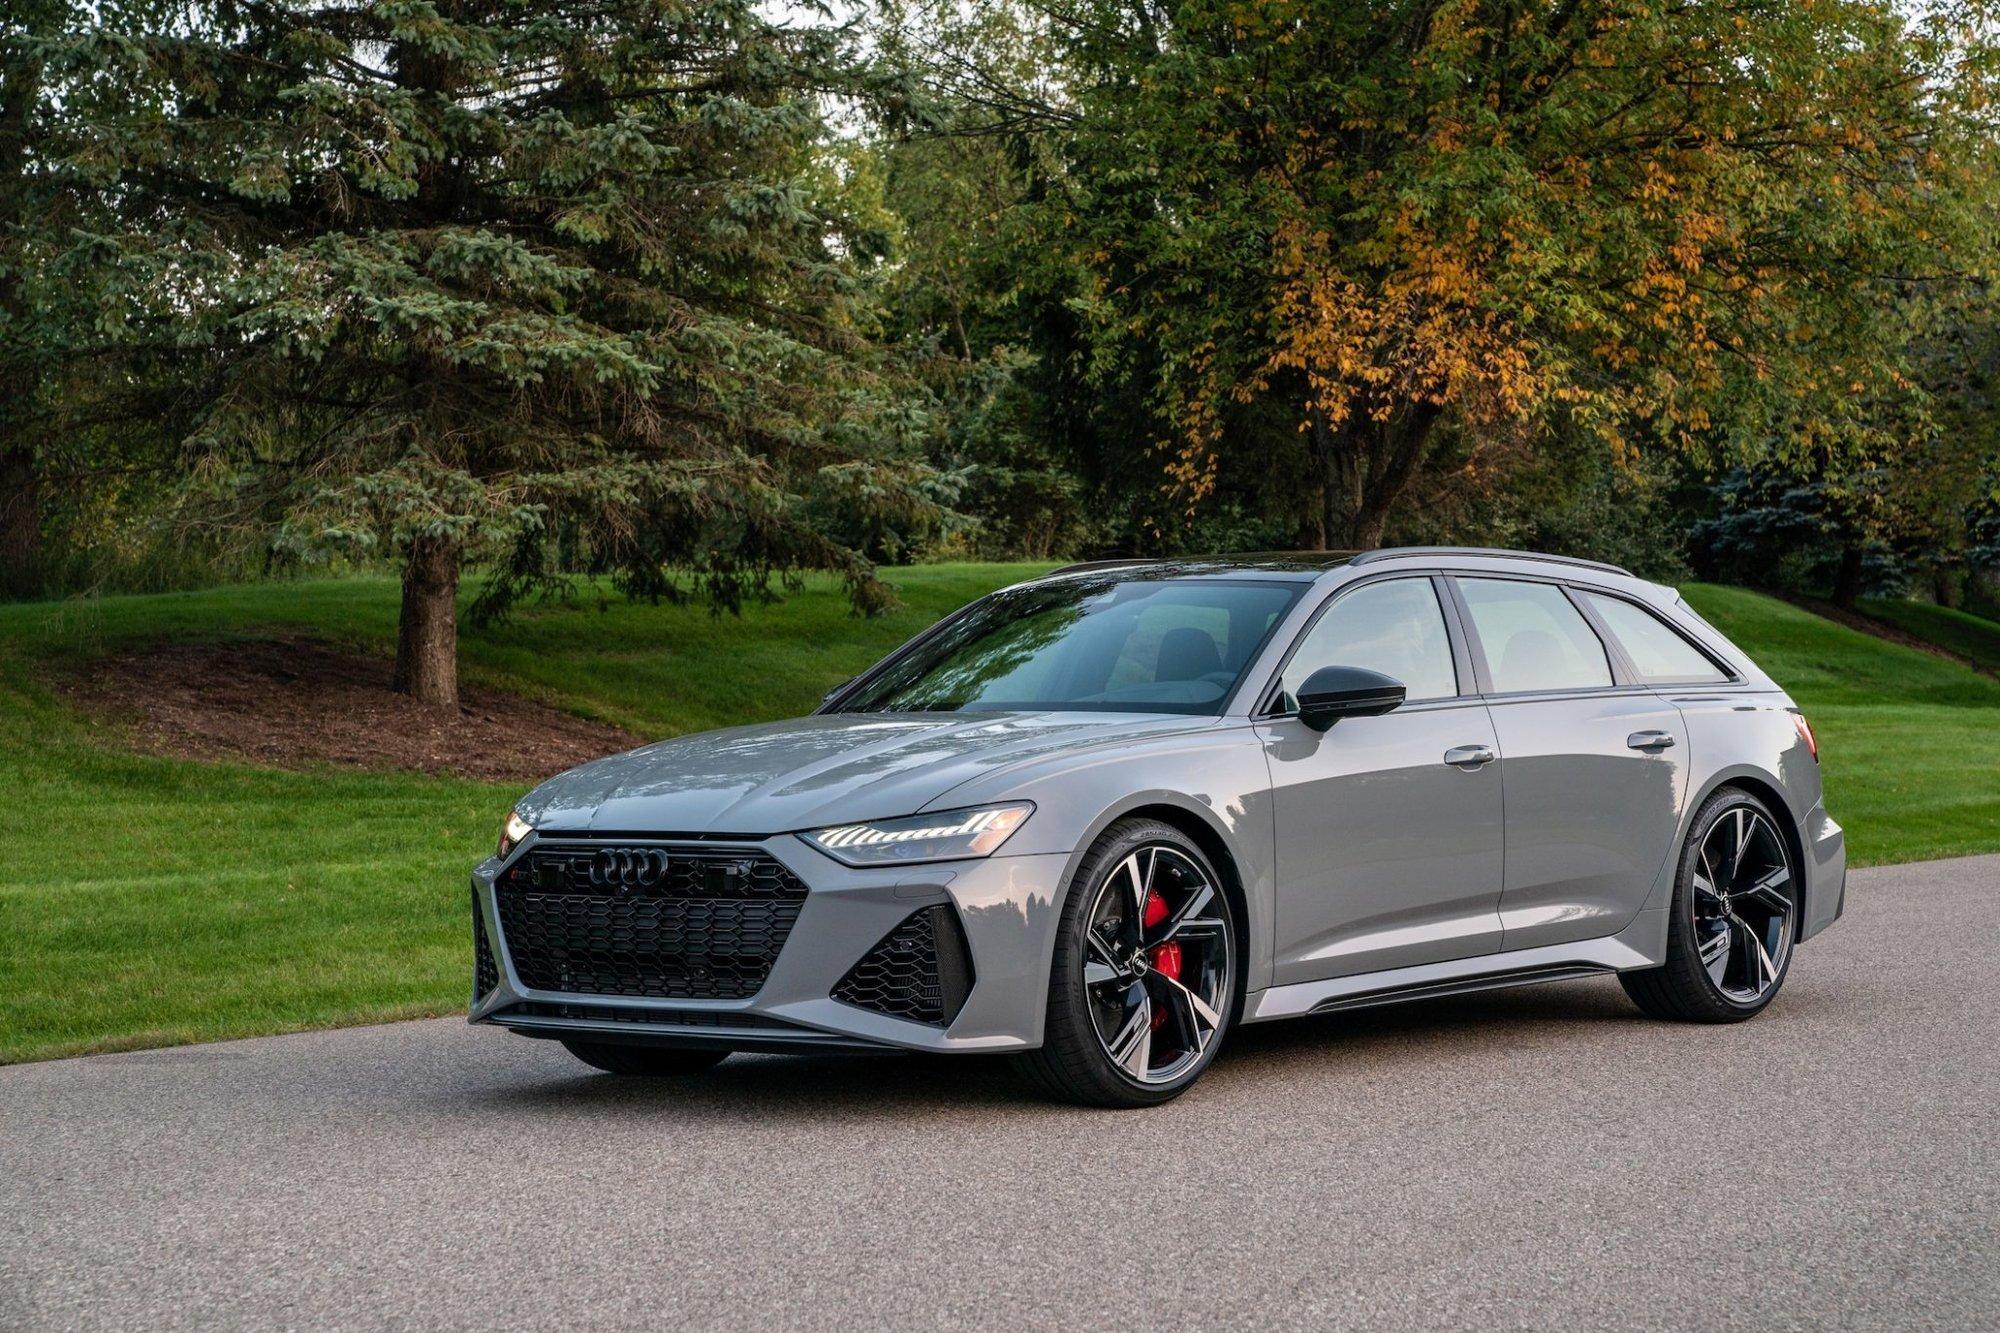 Audi-Avant-2048x1365.jpg